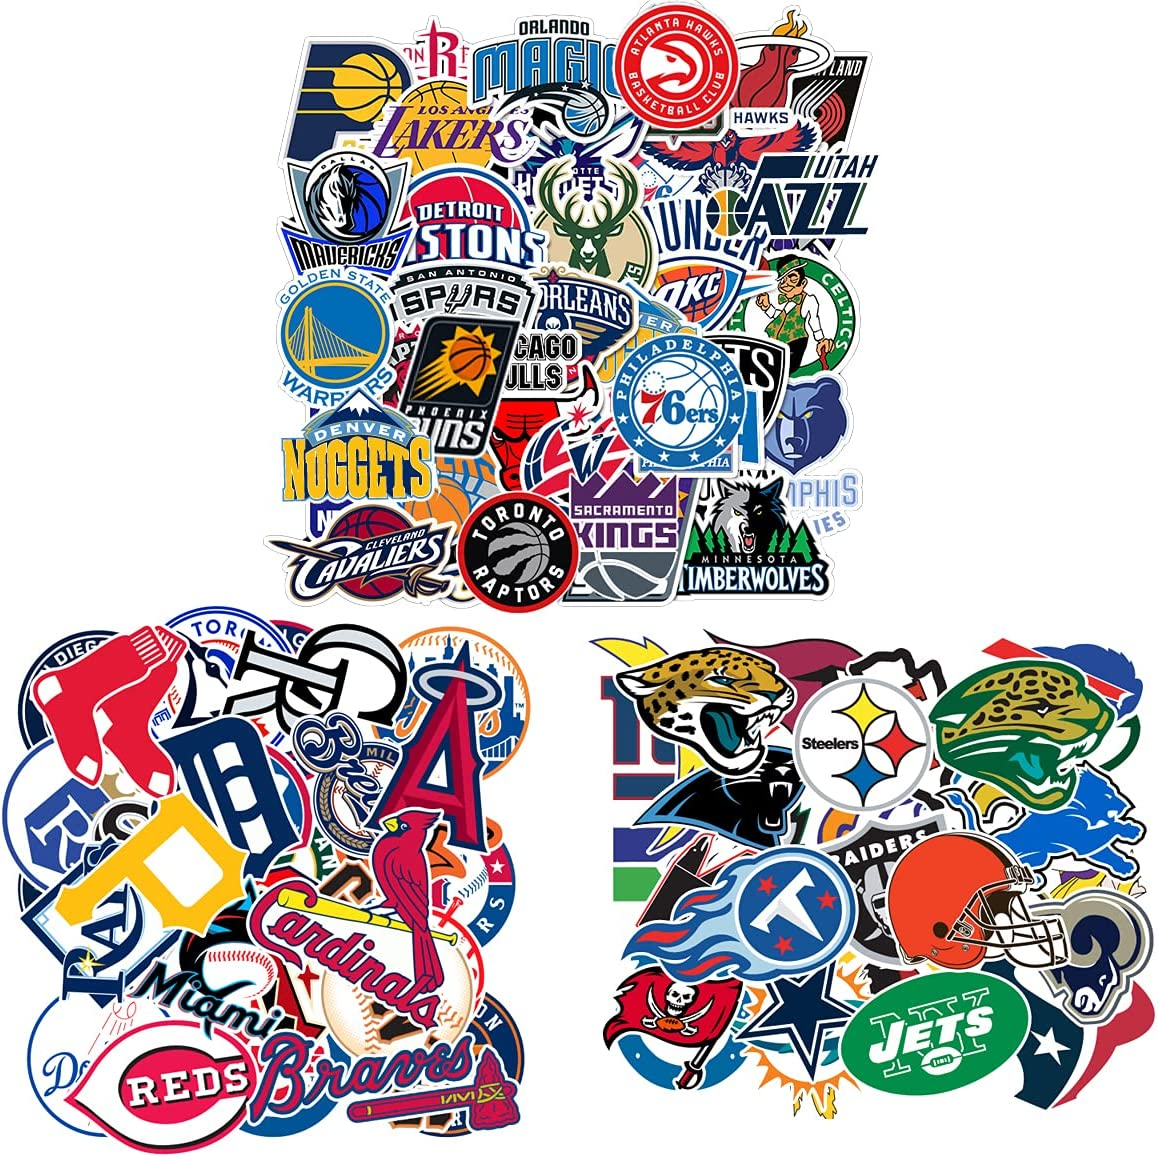 93Pcs Sports Sticker Packs,31 Basketball Stickers & 30 Baseball Stickers & 32 Football Stickers,Team Logo Stickers for Water Bottles Laptop Skateboard,Waterproof Vinyl Stickers for Adults Teens